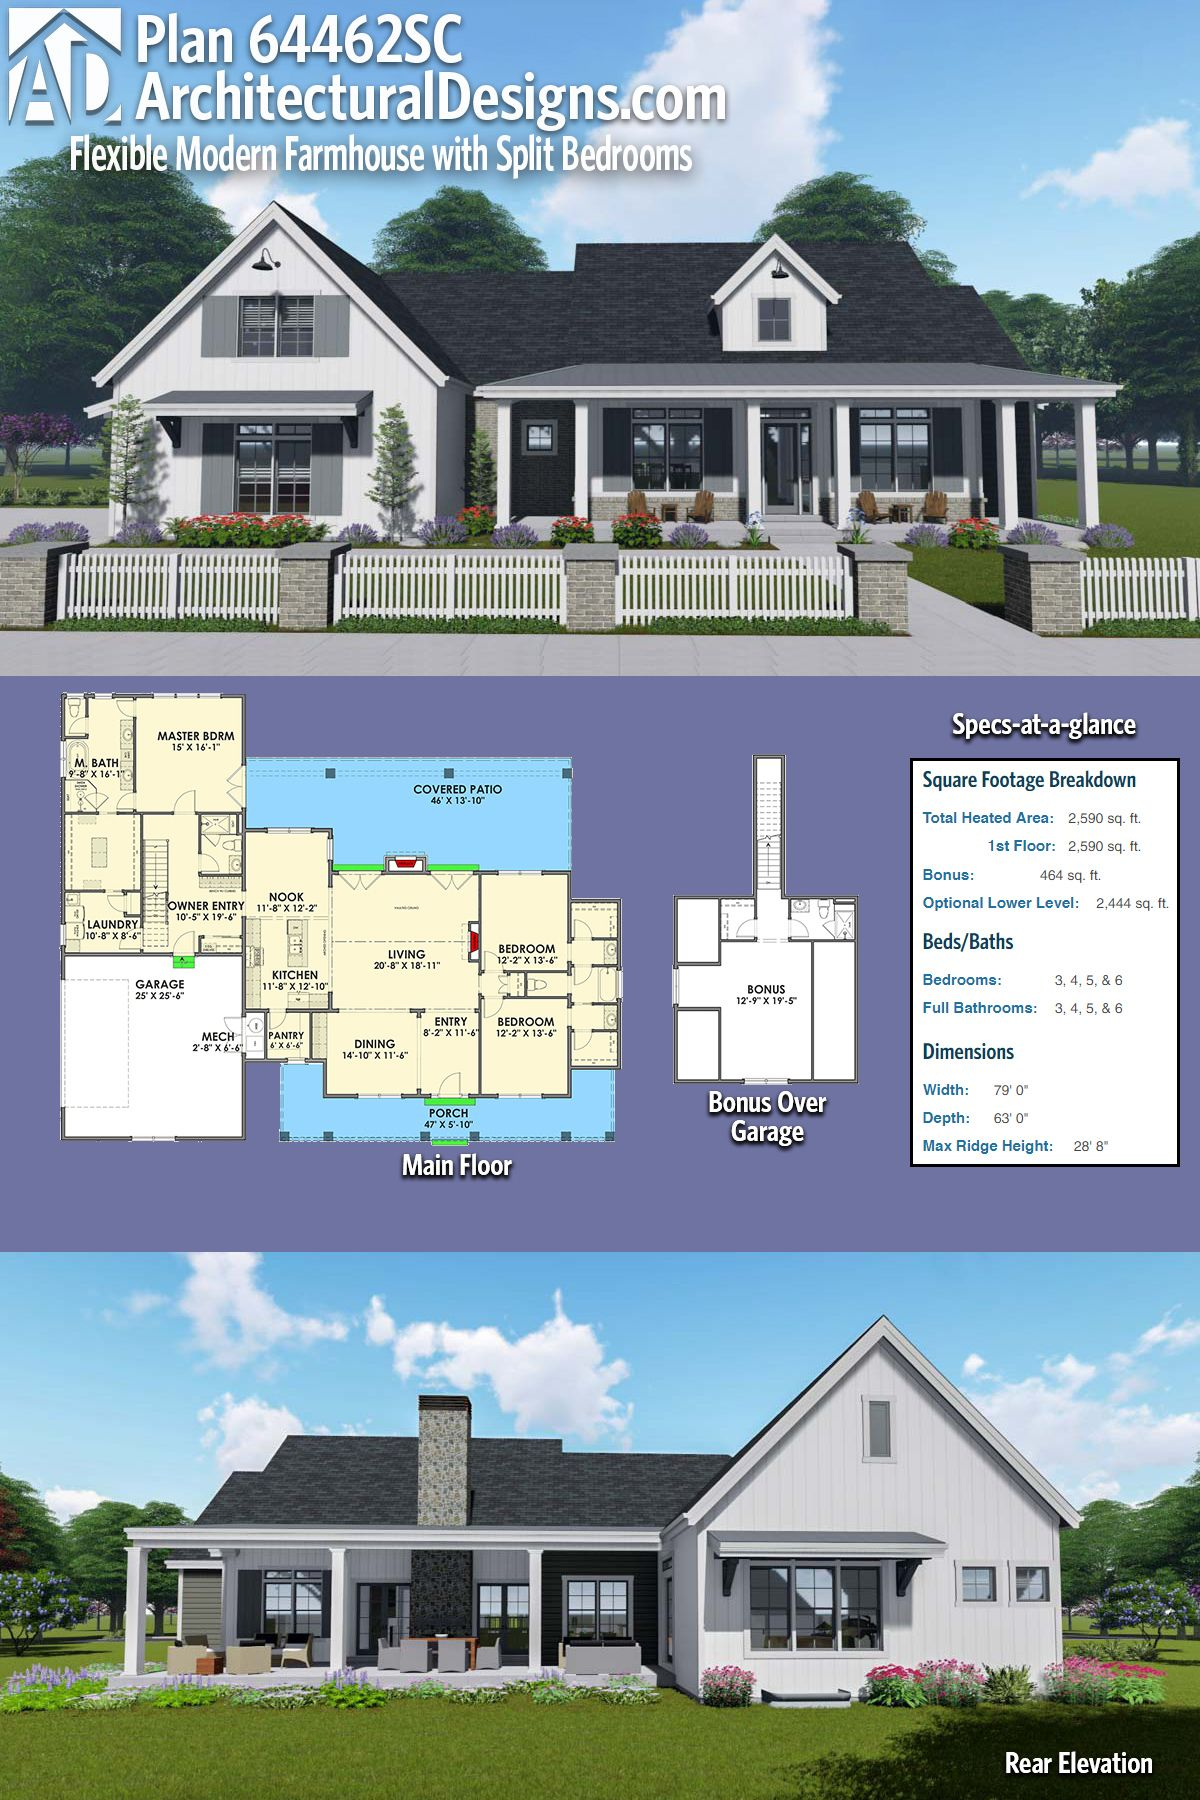 Plan 64462SC Flexible Modern Farmhouse with